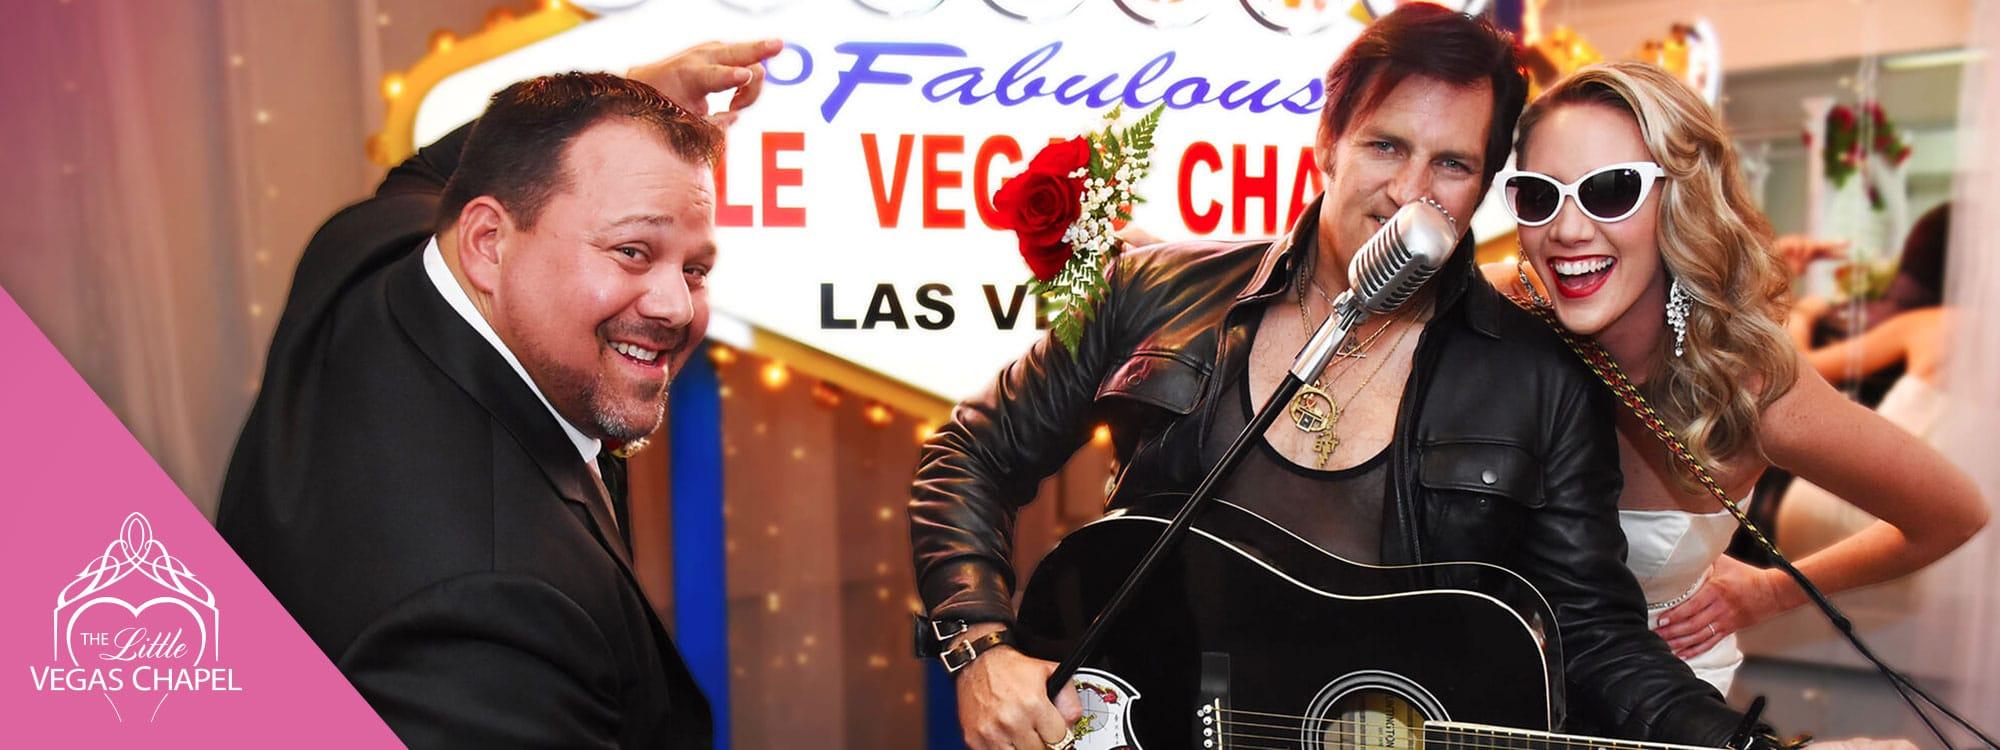 Las Vegas Sign Wedding Slide